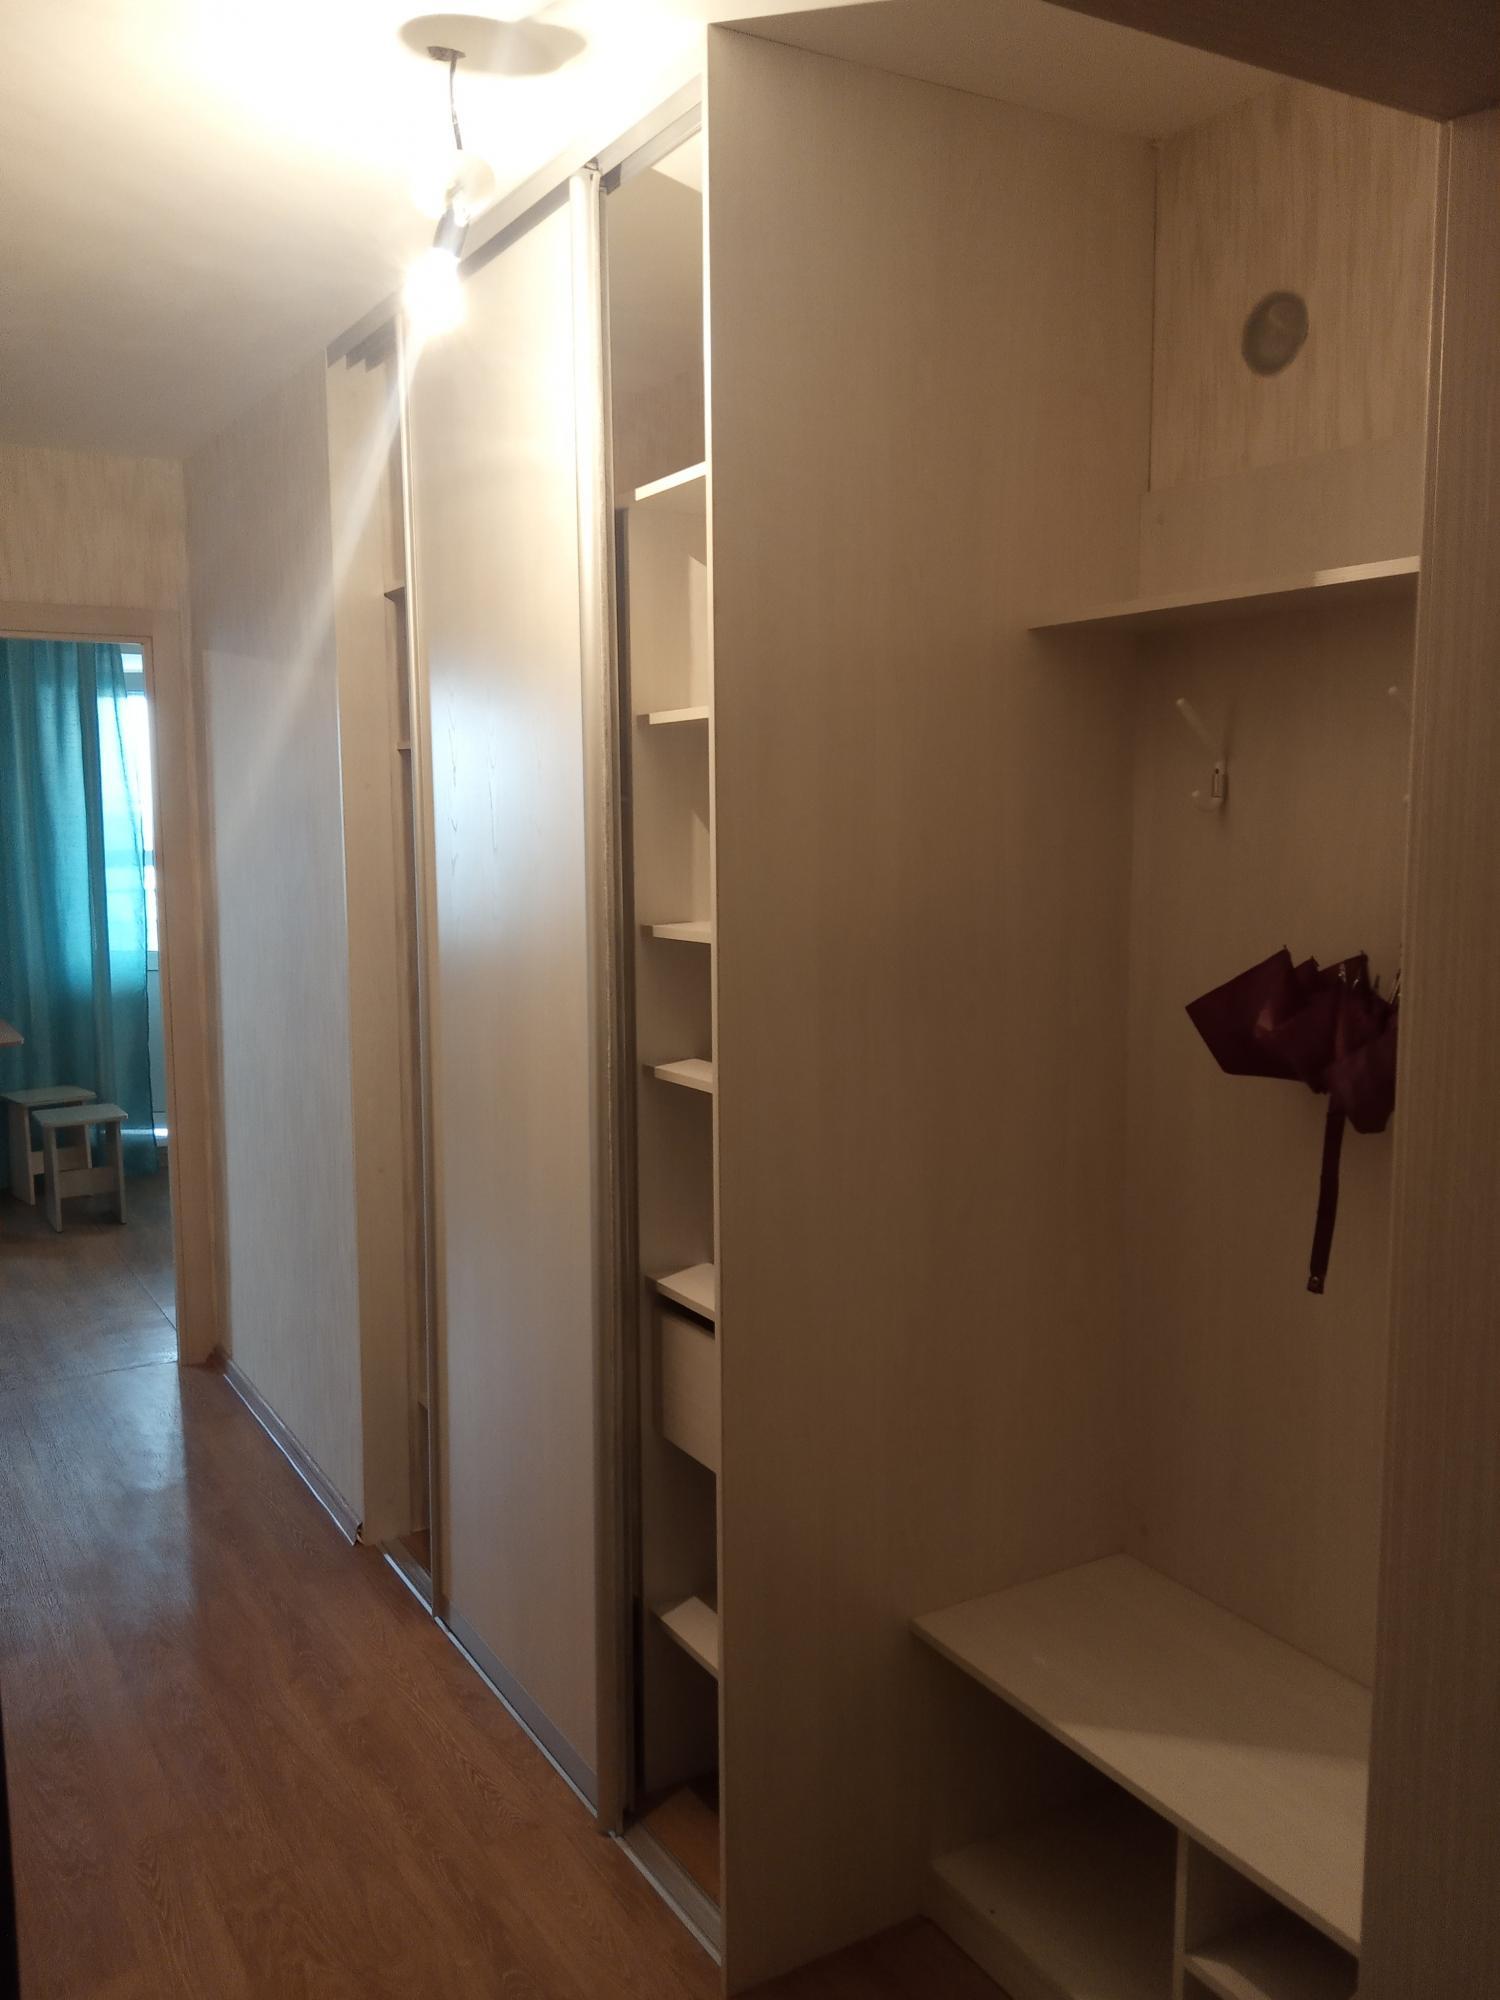 1к квартира Краснодарская улица, 22А | 15500 | аренда в Красноярске фото 3